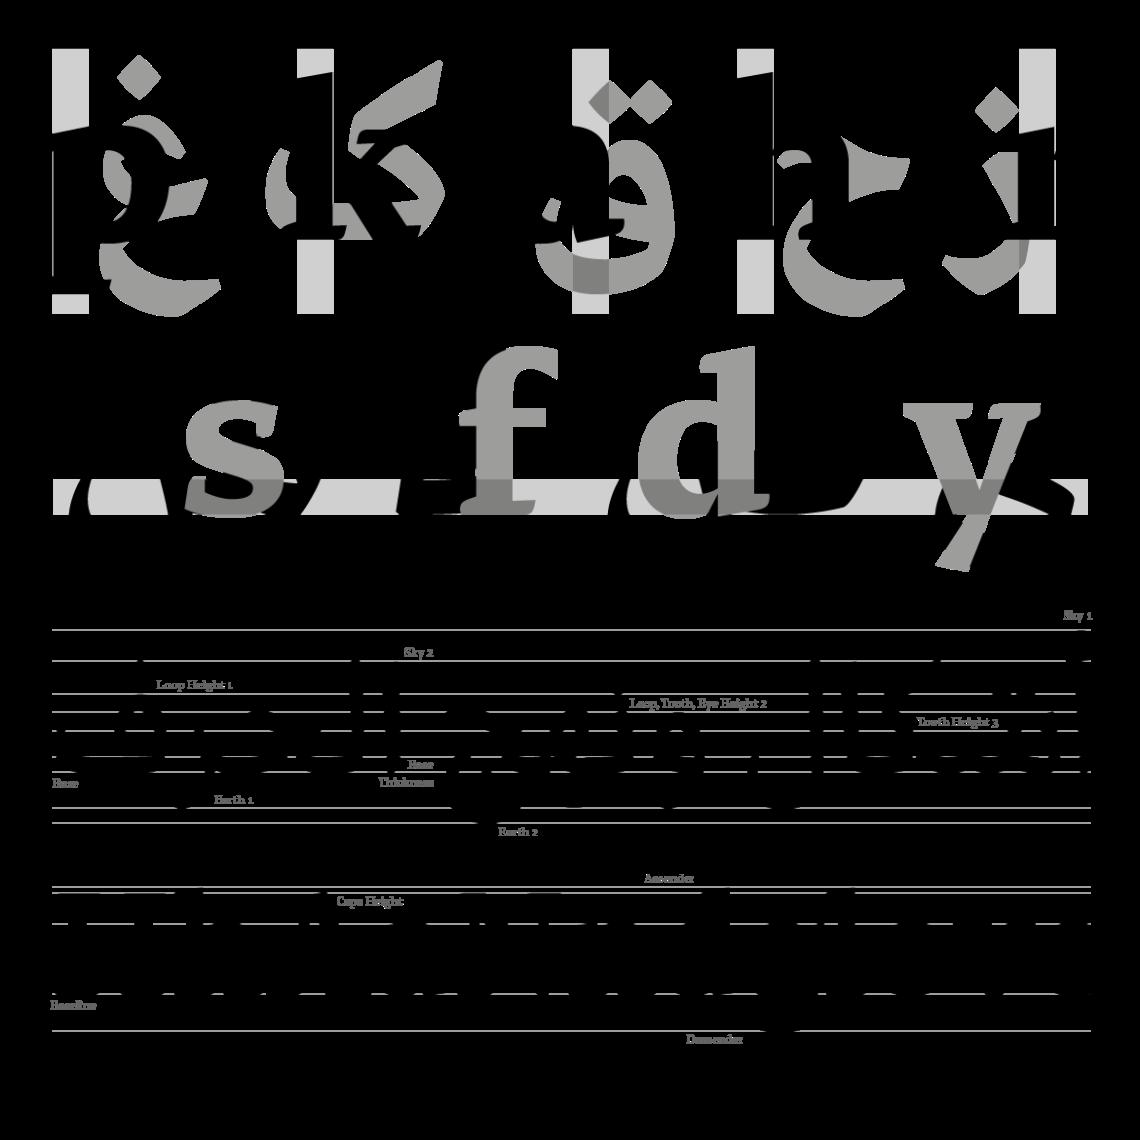 29LT-Zarid-Text-Image-06